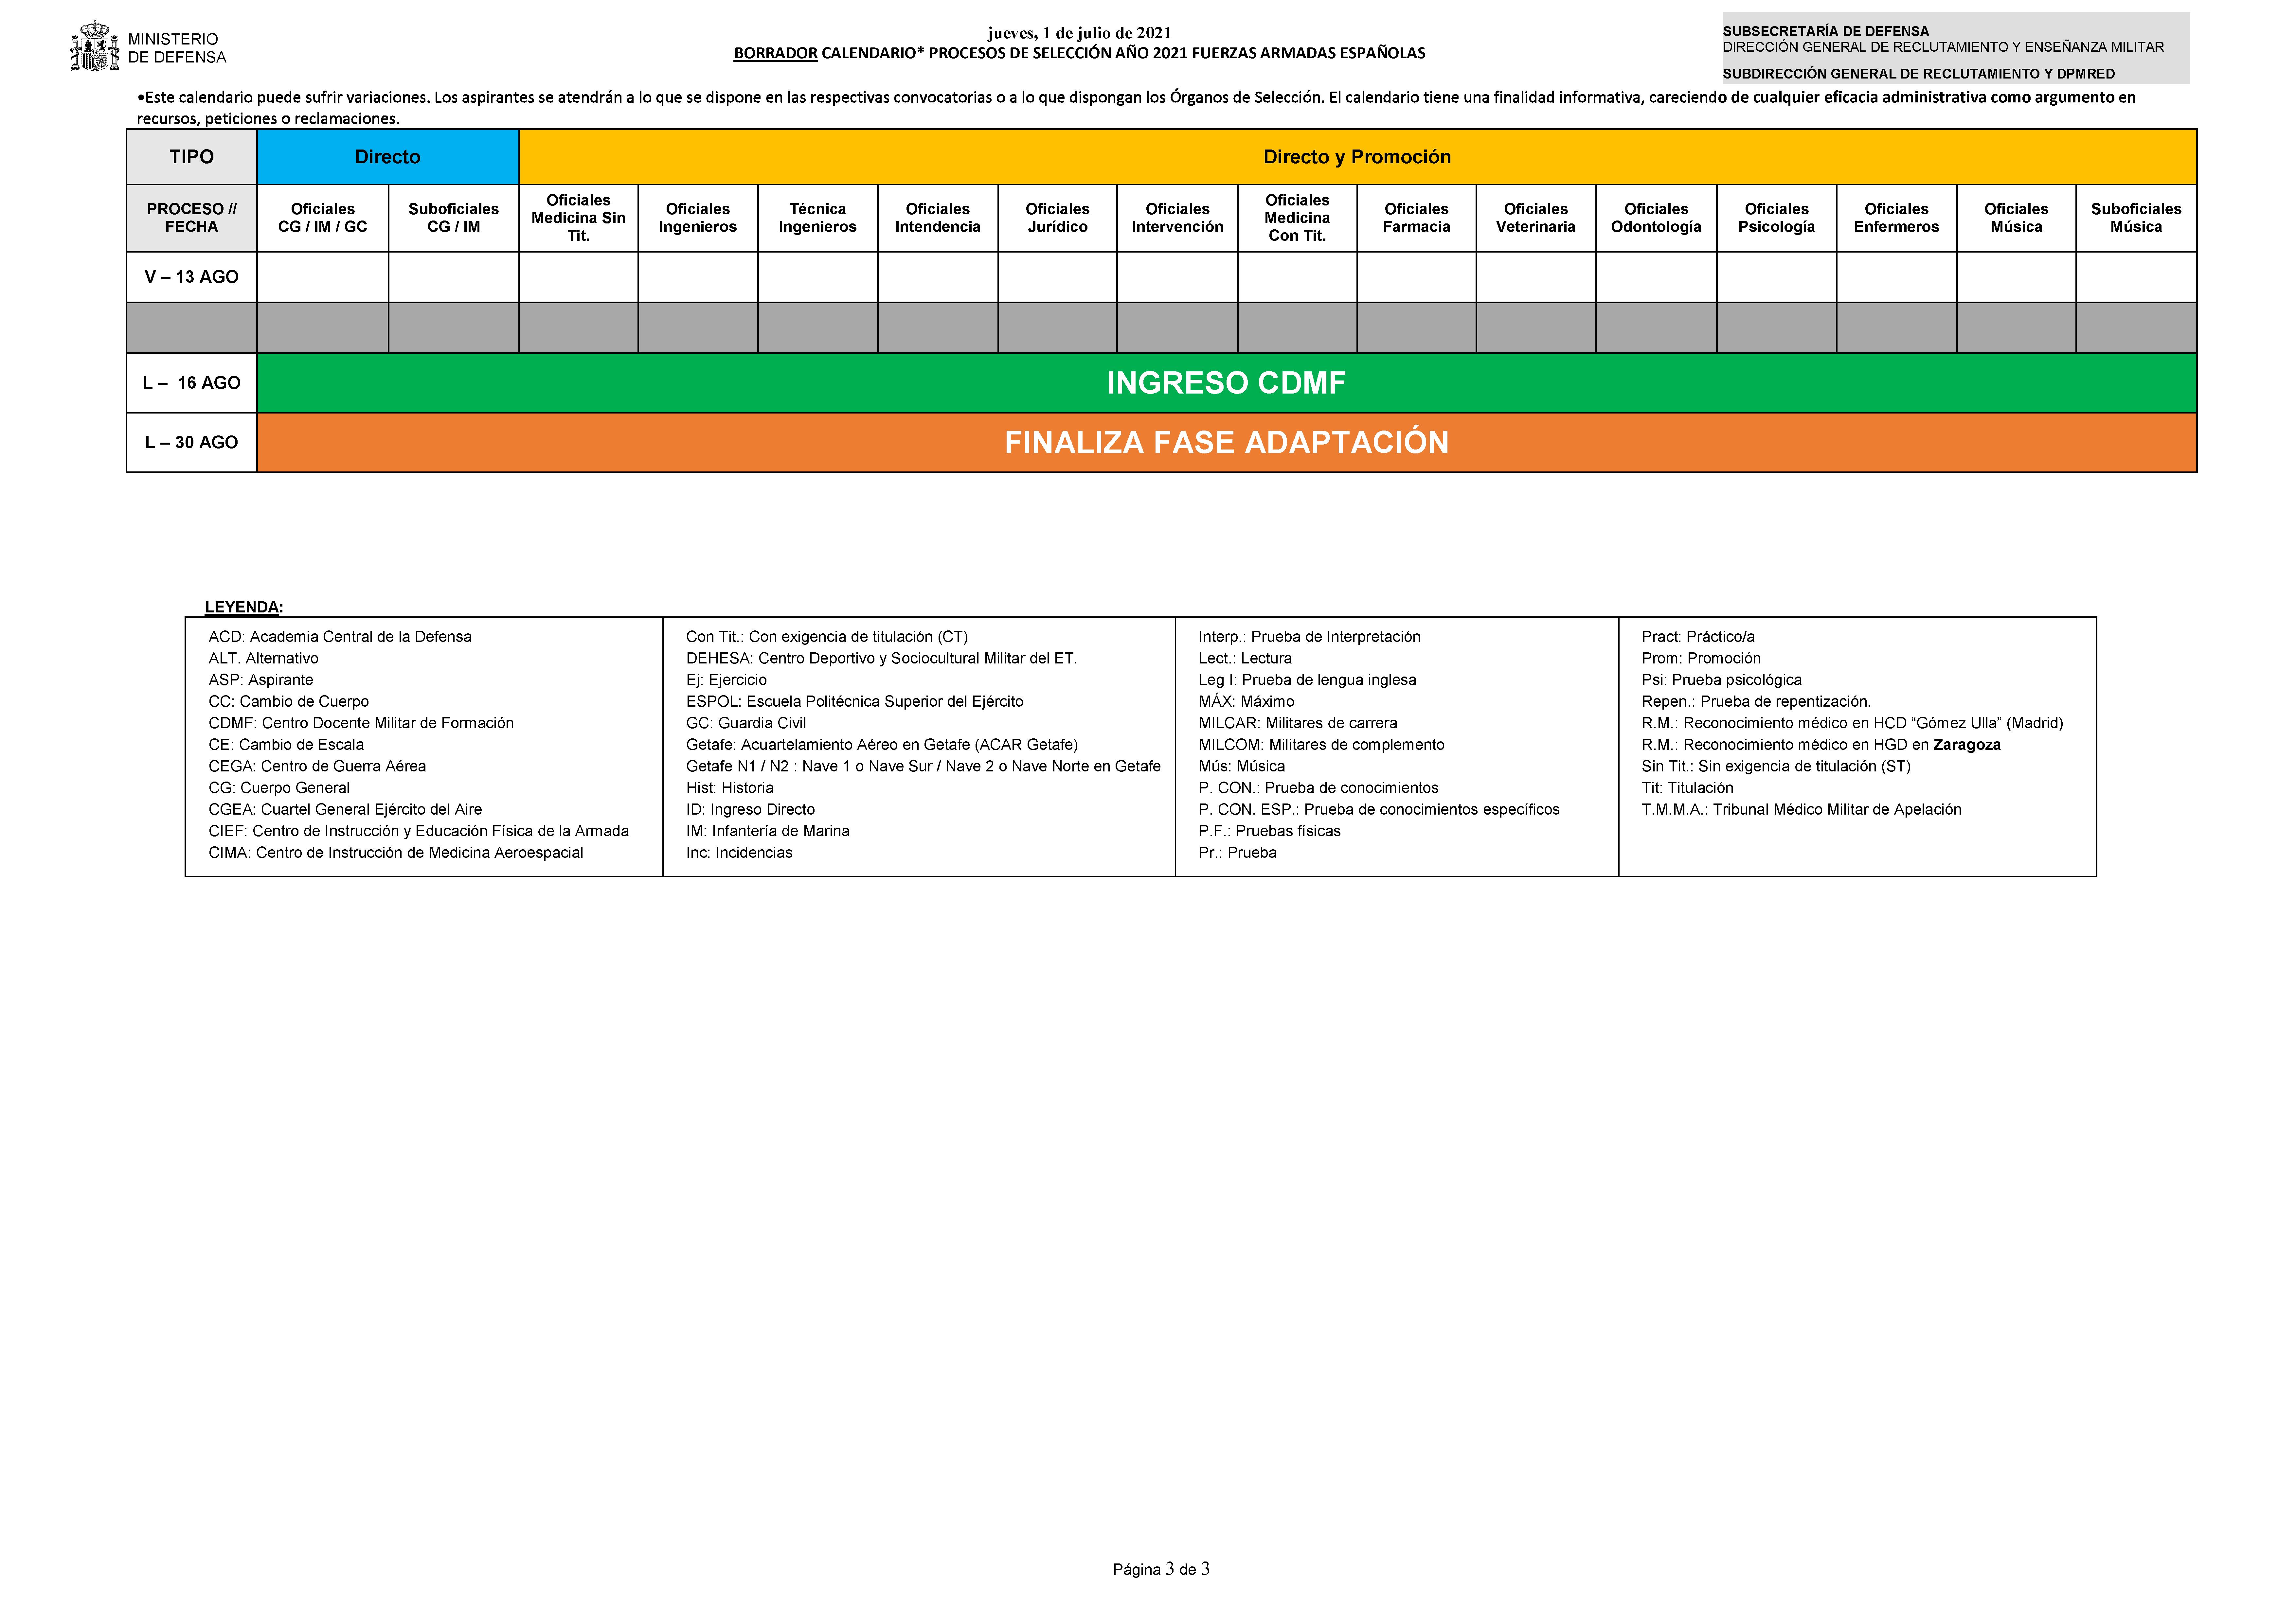 Calendario_Provisional_Procesos_de_Seleccion_2021_Página_3